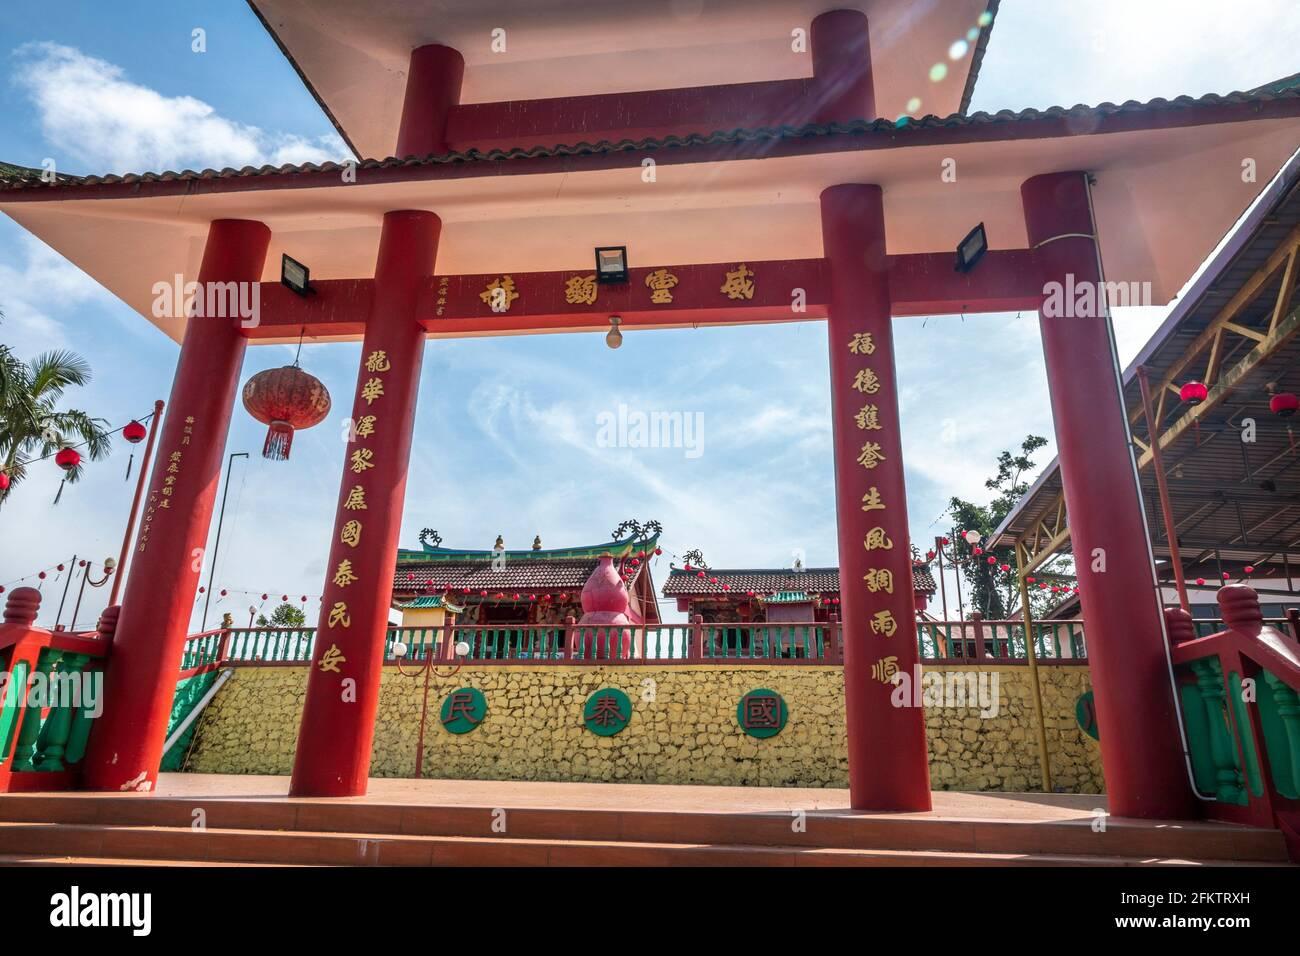 Chinese temple, Kampung Musi, Bau, Sarawak, East Malaysia Stock Photo